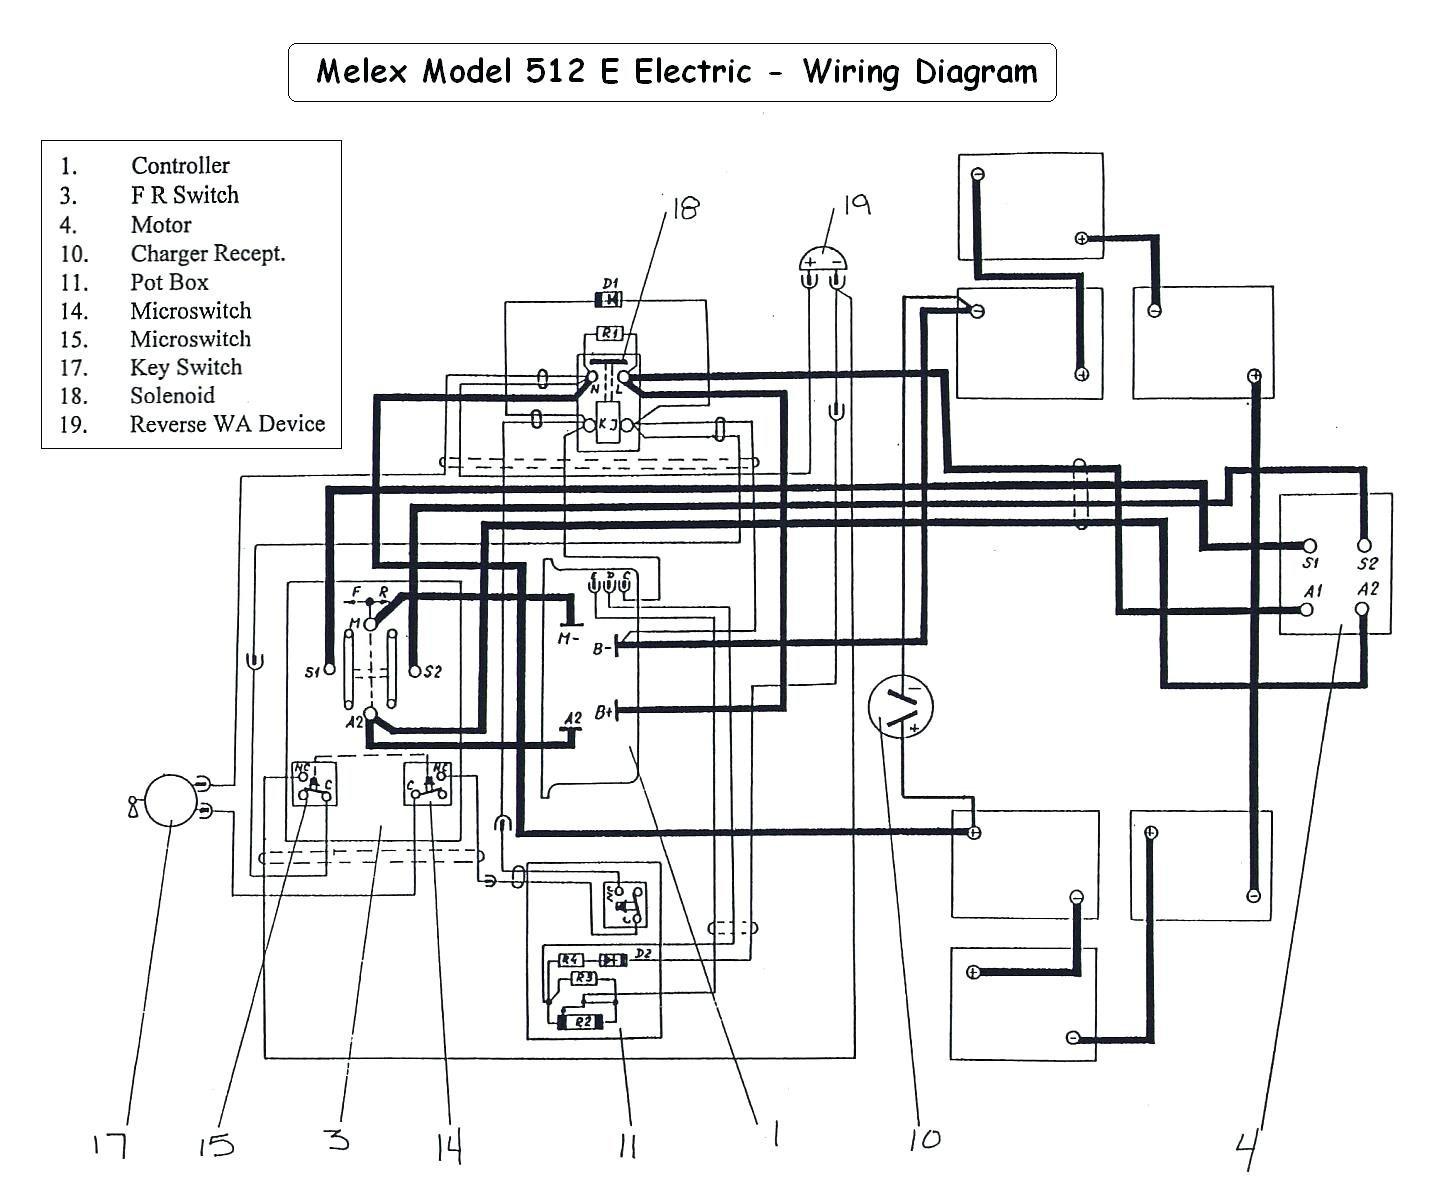 Cushman Golf Cart 36 Volt Wiring Diagram 1974 To -Ford Wiring Diagram 1992  | Begeboy Wiring Diagram SourceBegeboy Wiring Diagram Source